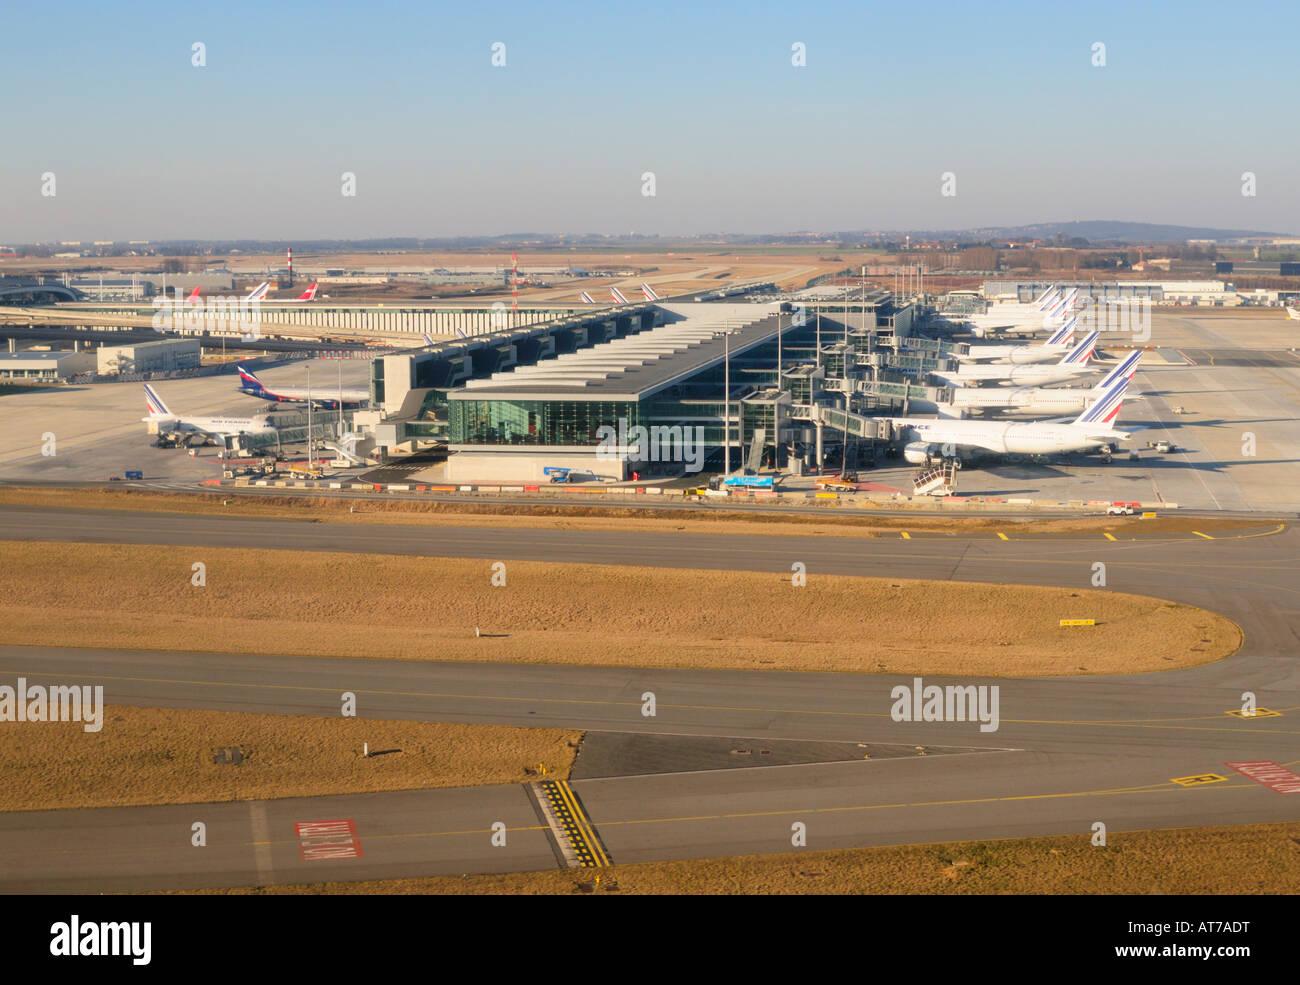 Charles de Gaulle Airport (CDG) Terminal 2E, Paris, France FR Stock Photo